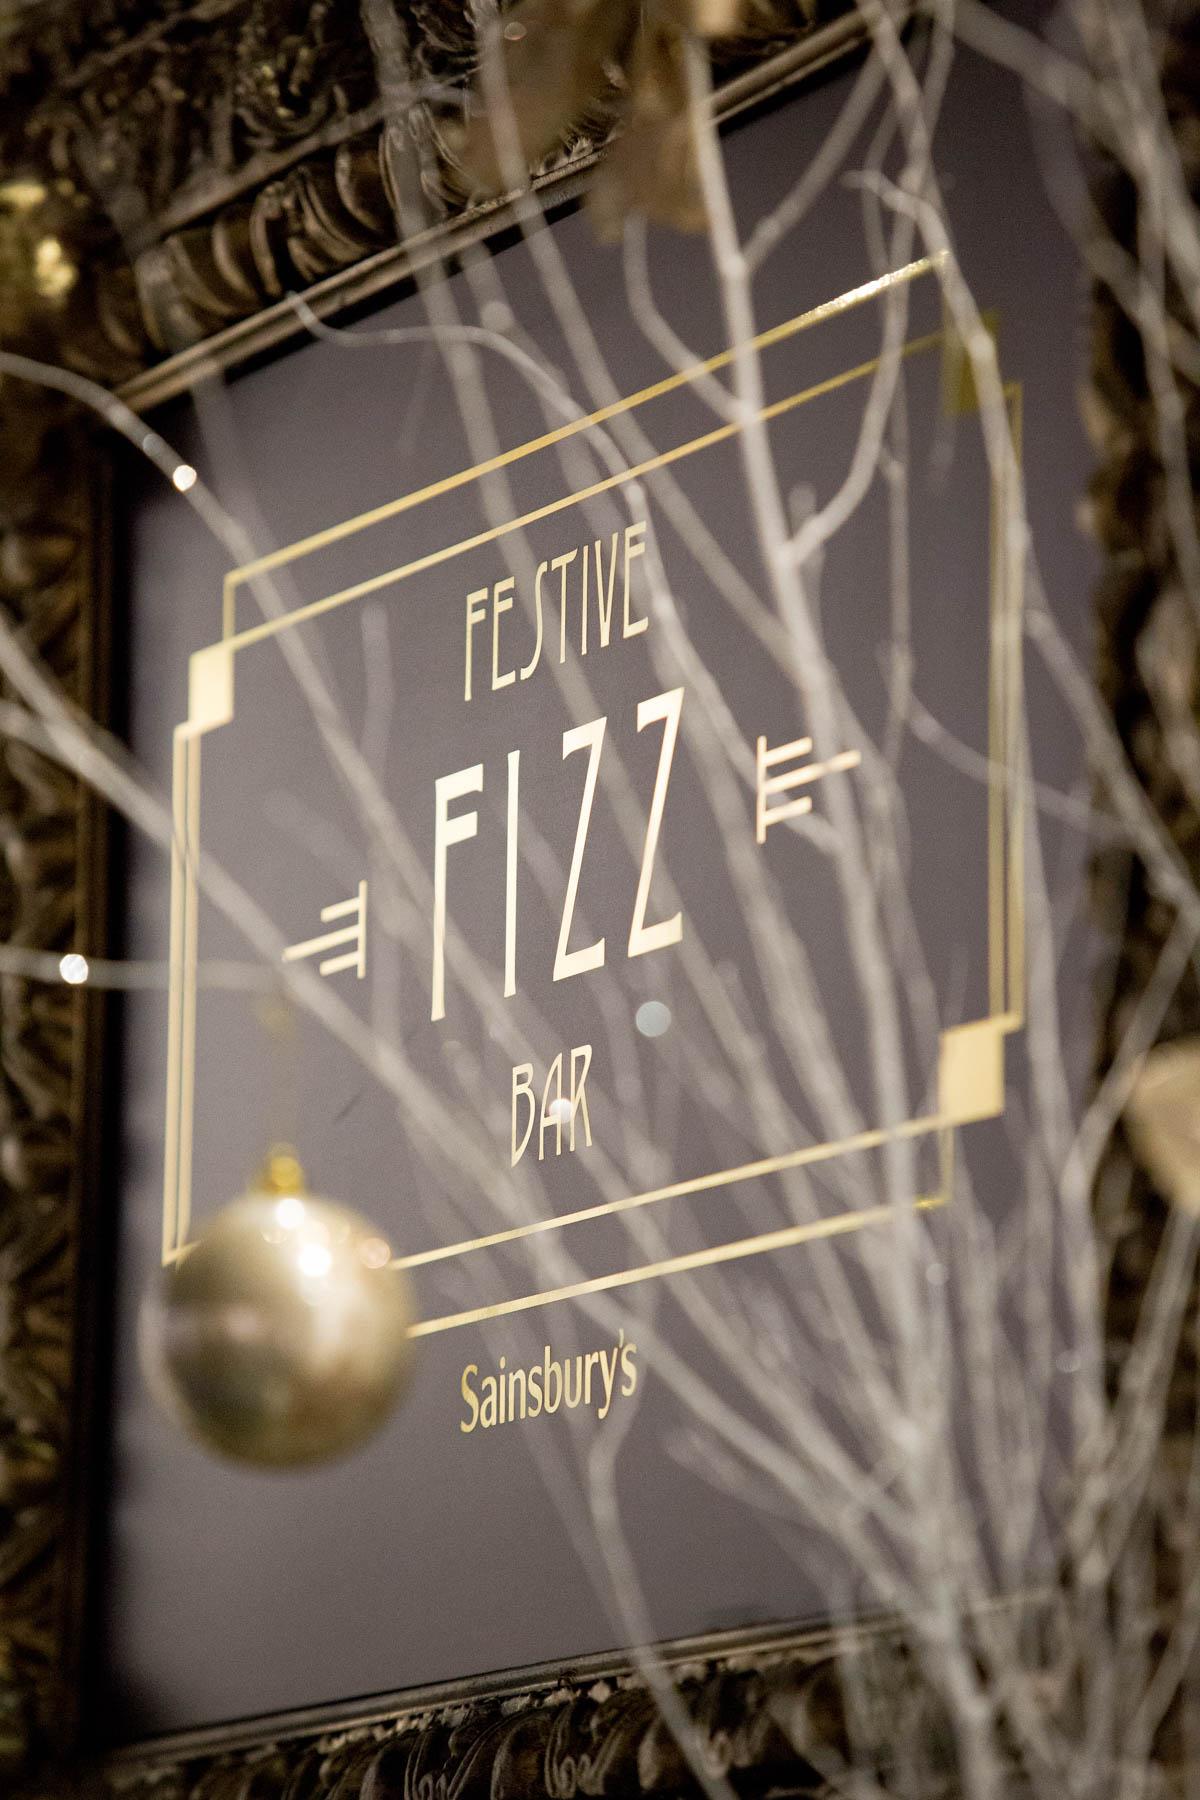 Bar at Sainsbury's Festive Fizz Bar Pop-Up